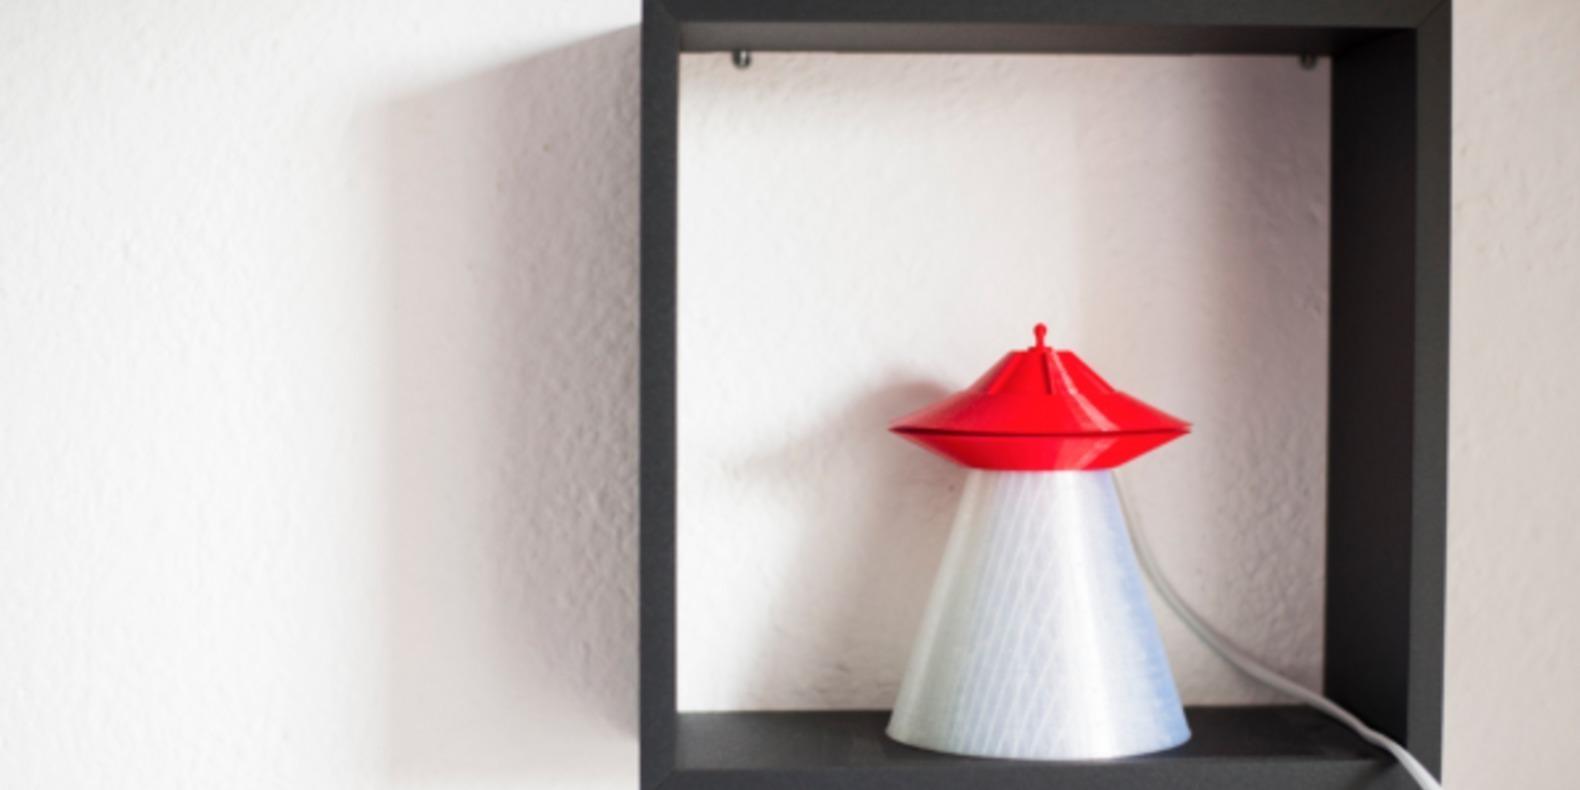 OVNI-lampe-UFO-cults-impression-3D-enfant-3.png